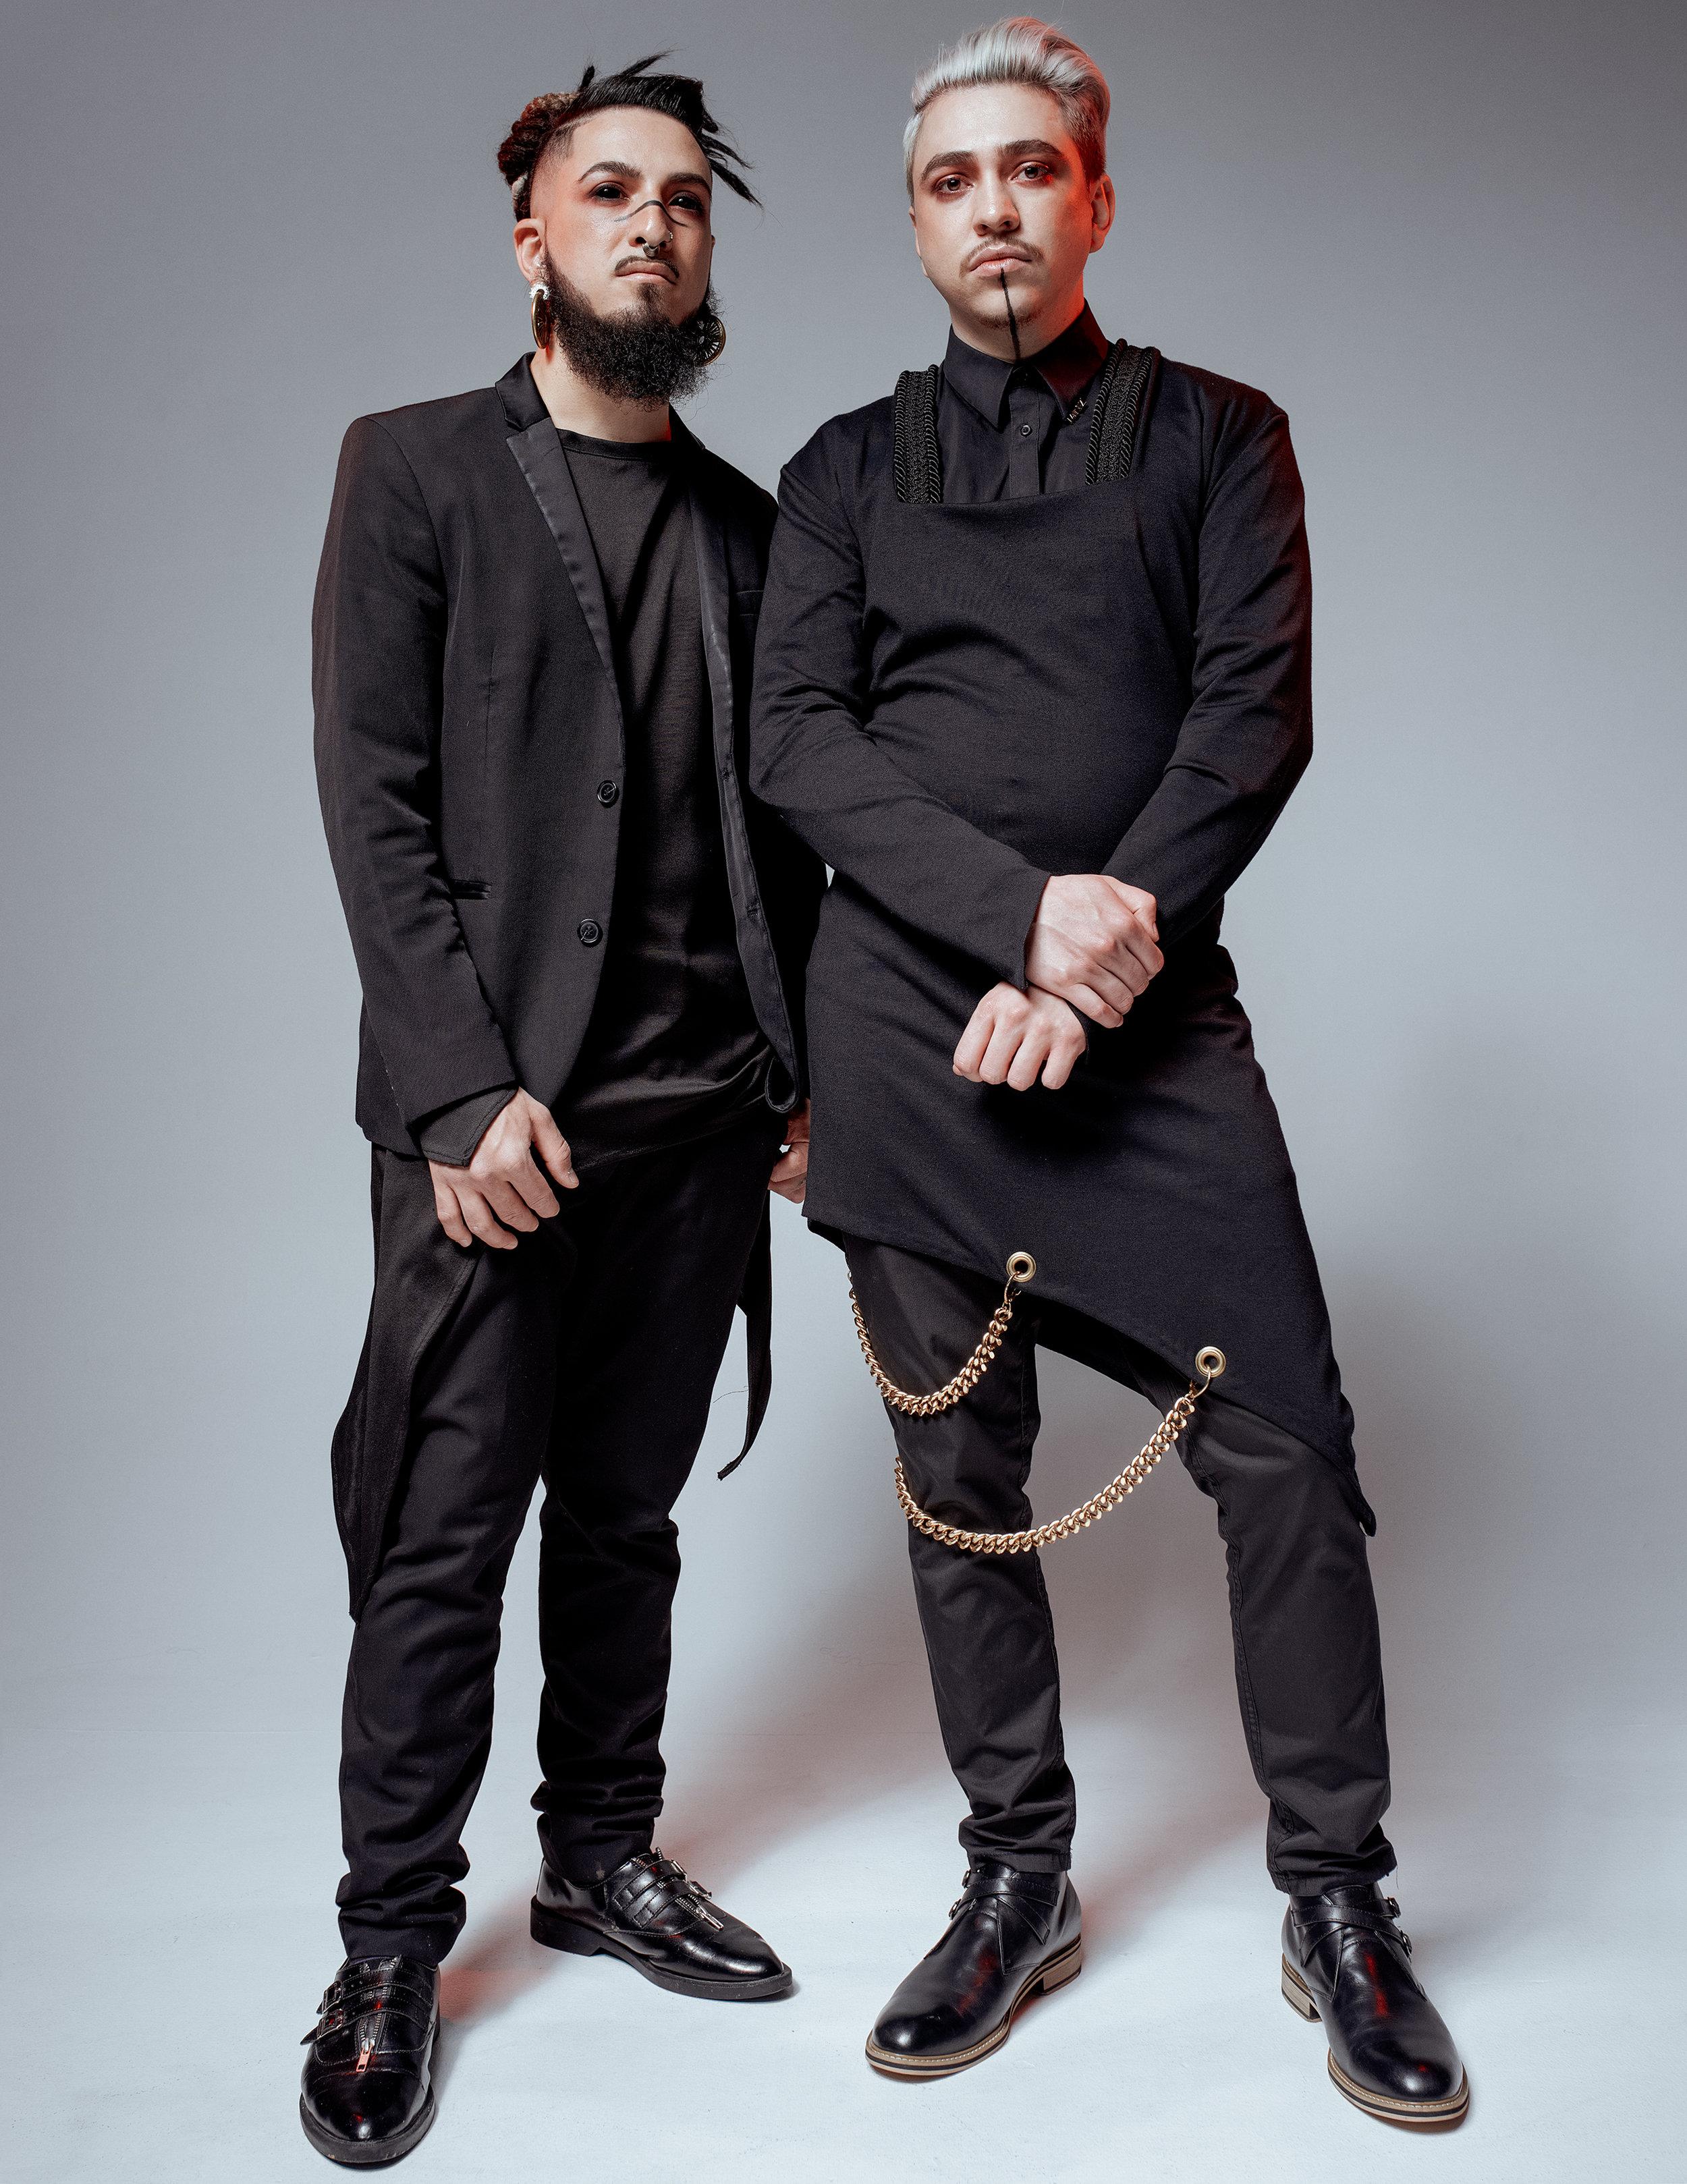 THE MEN OF MENEZ - Models Vinny Jimenez and Saul JimenezFull Story MenezToSociety: MenswearMakeup Eric QuintanaStylist & Written by Stephen GarciaPhotographed by Jonny Edwards